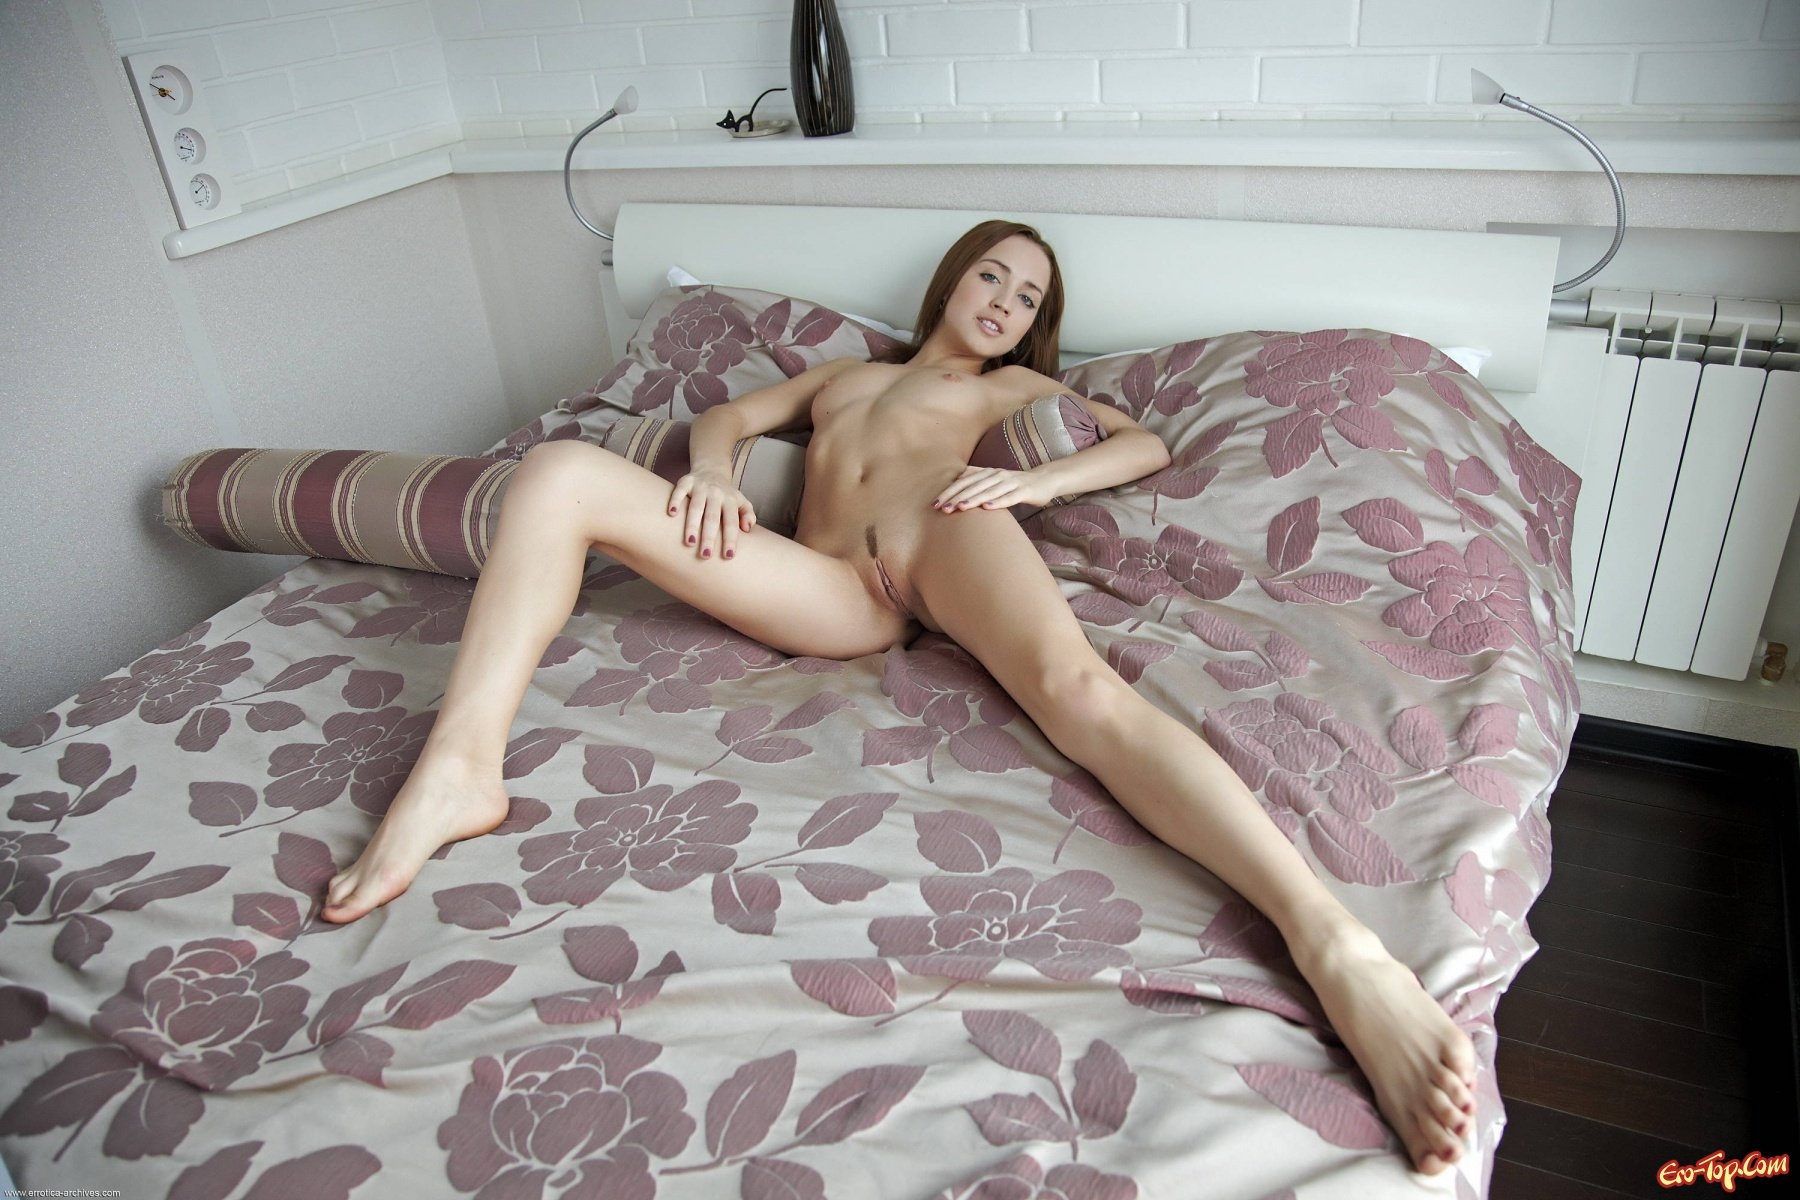 Обнаженная стройная девка